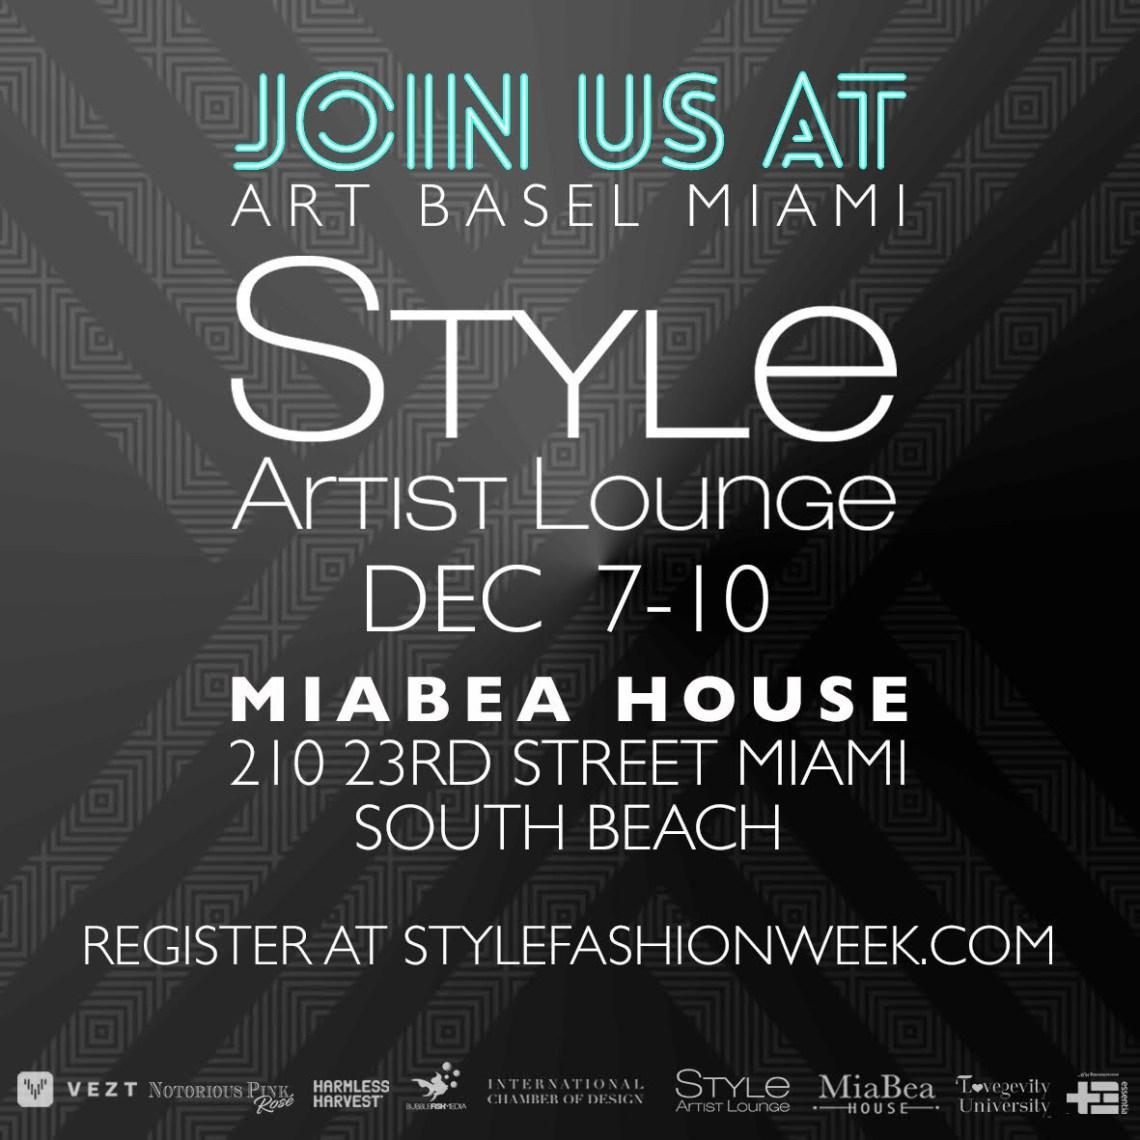 Style Artist Lounge